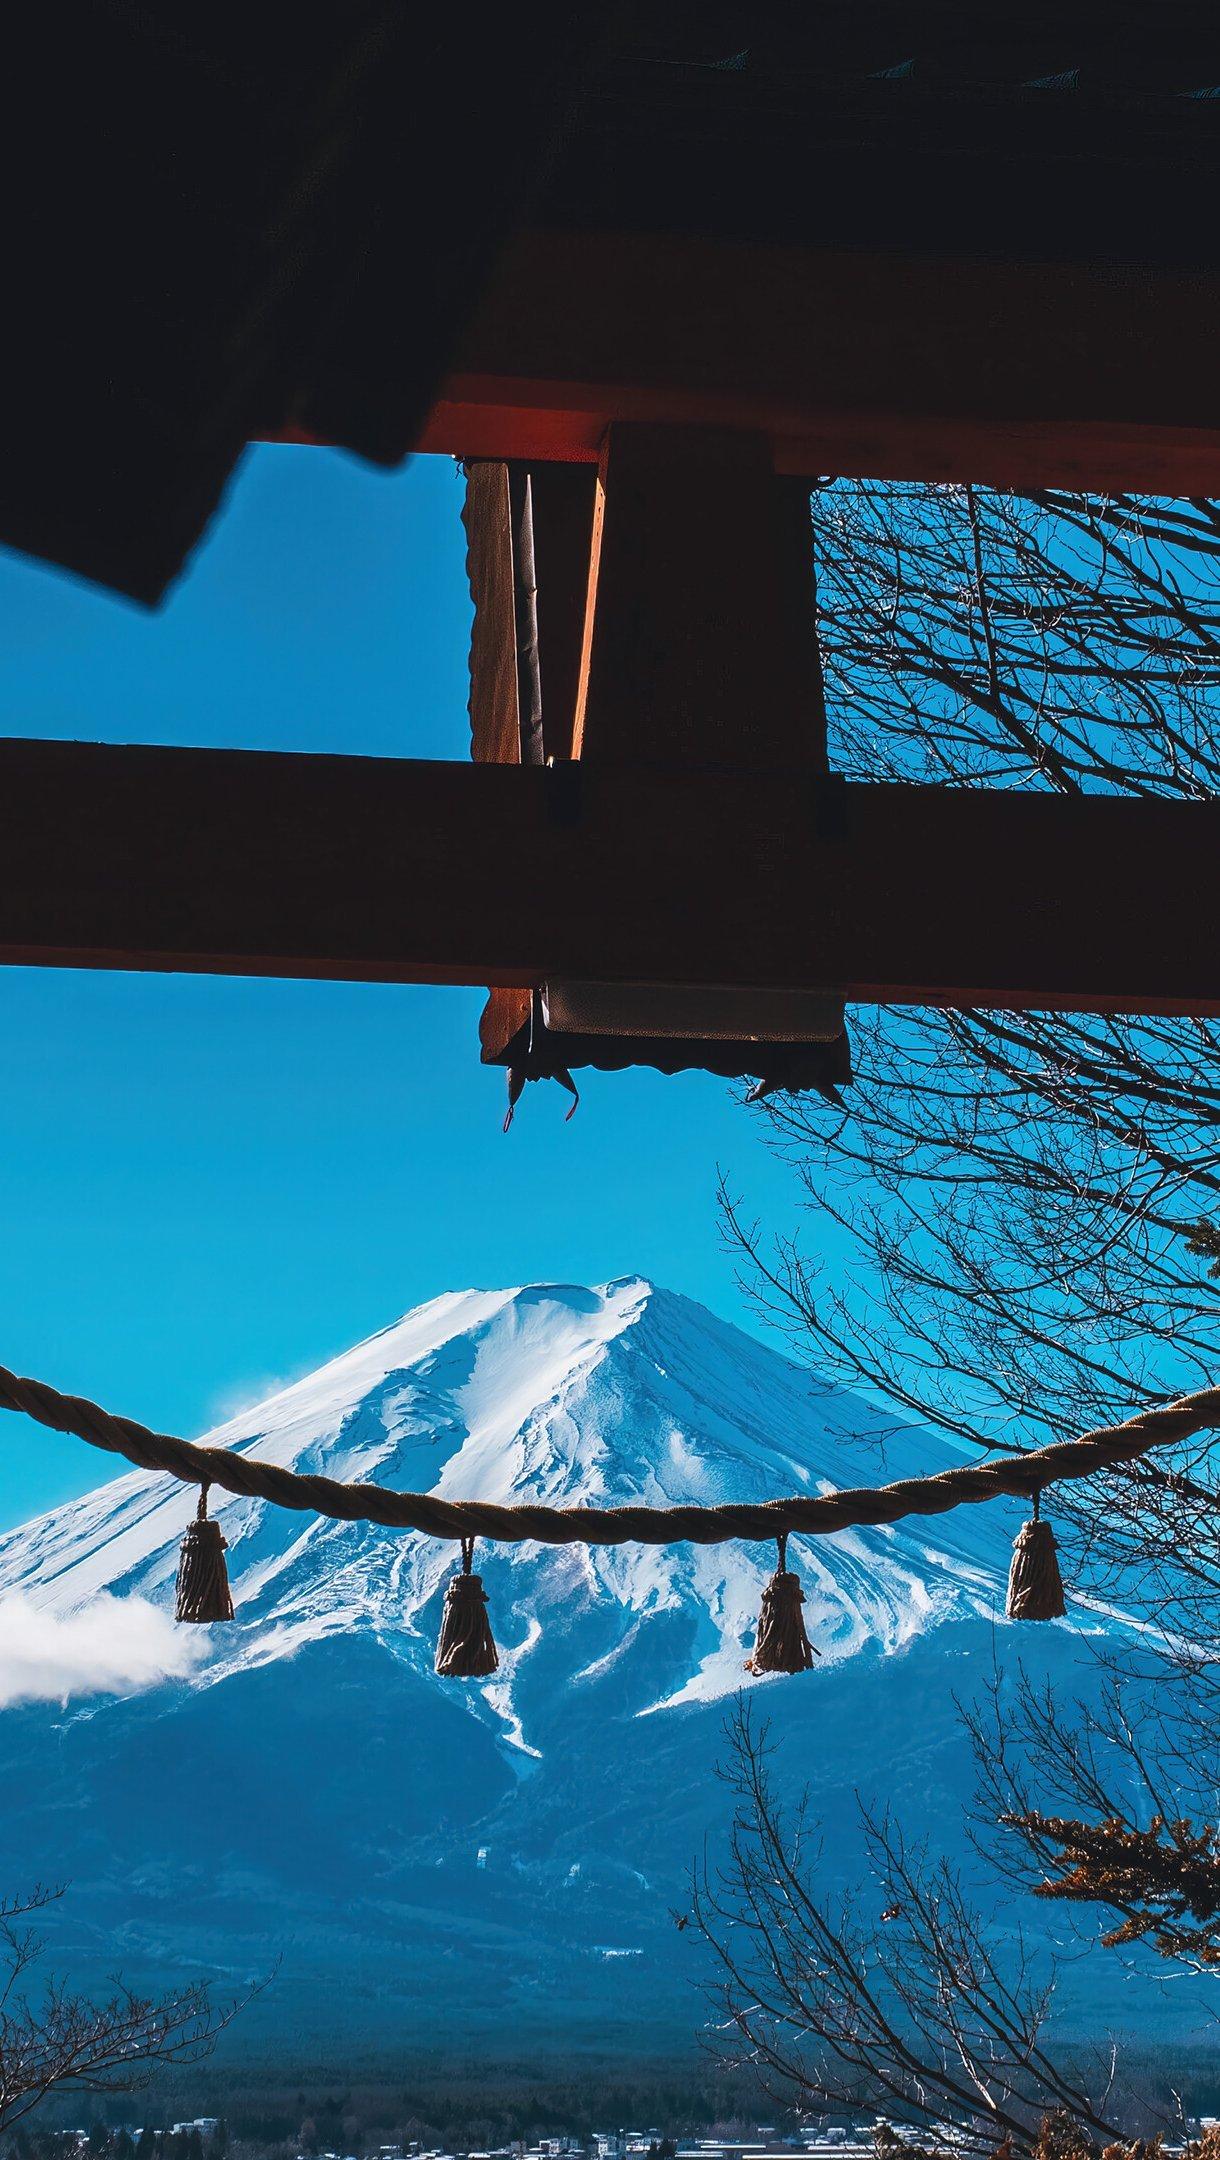 Wallpaper Mountain in Japan Vertical